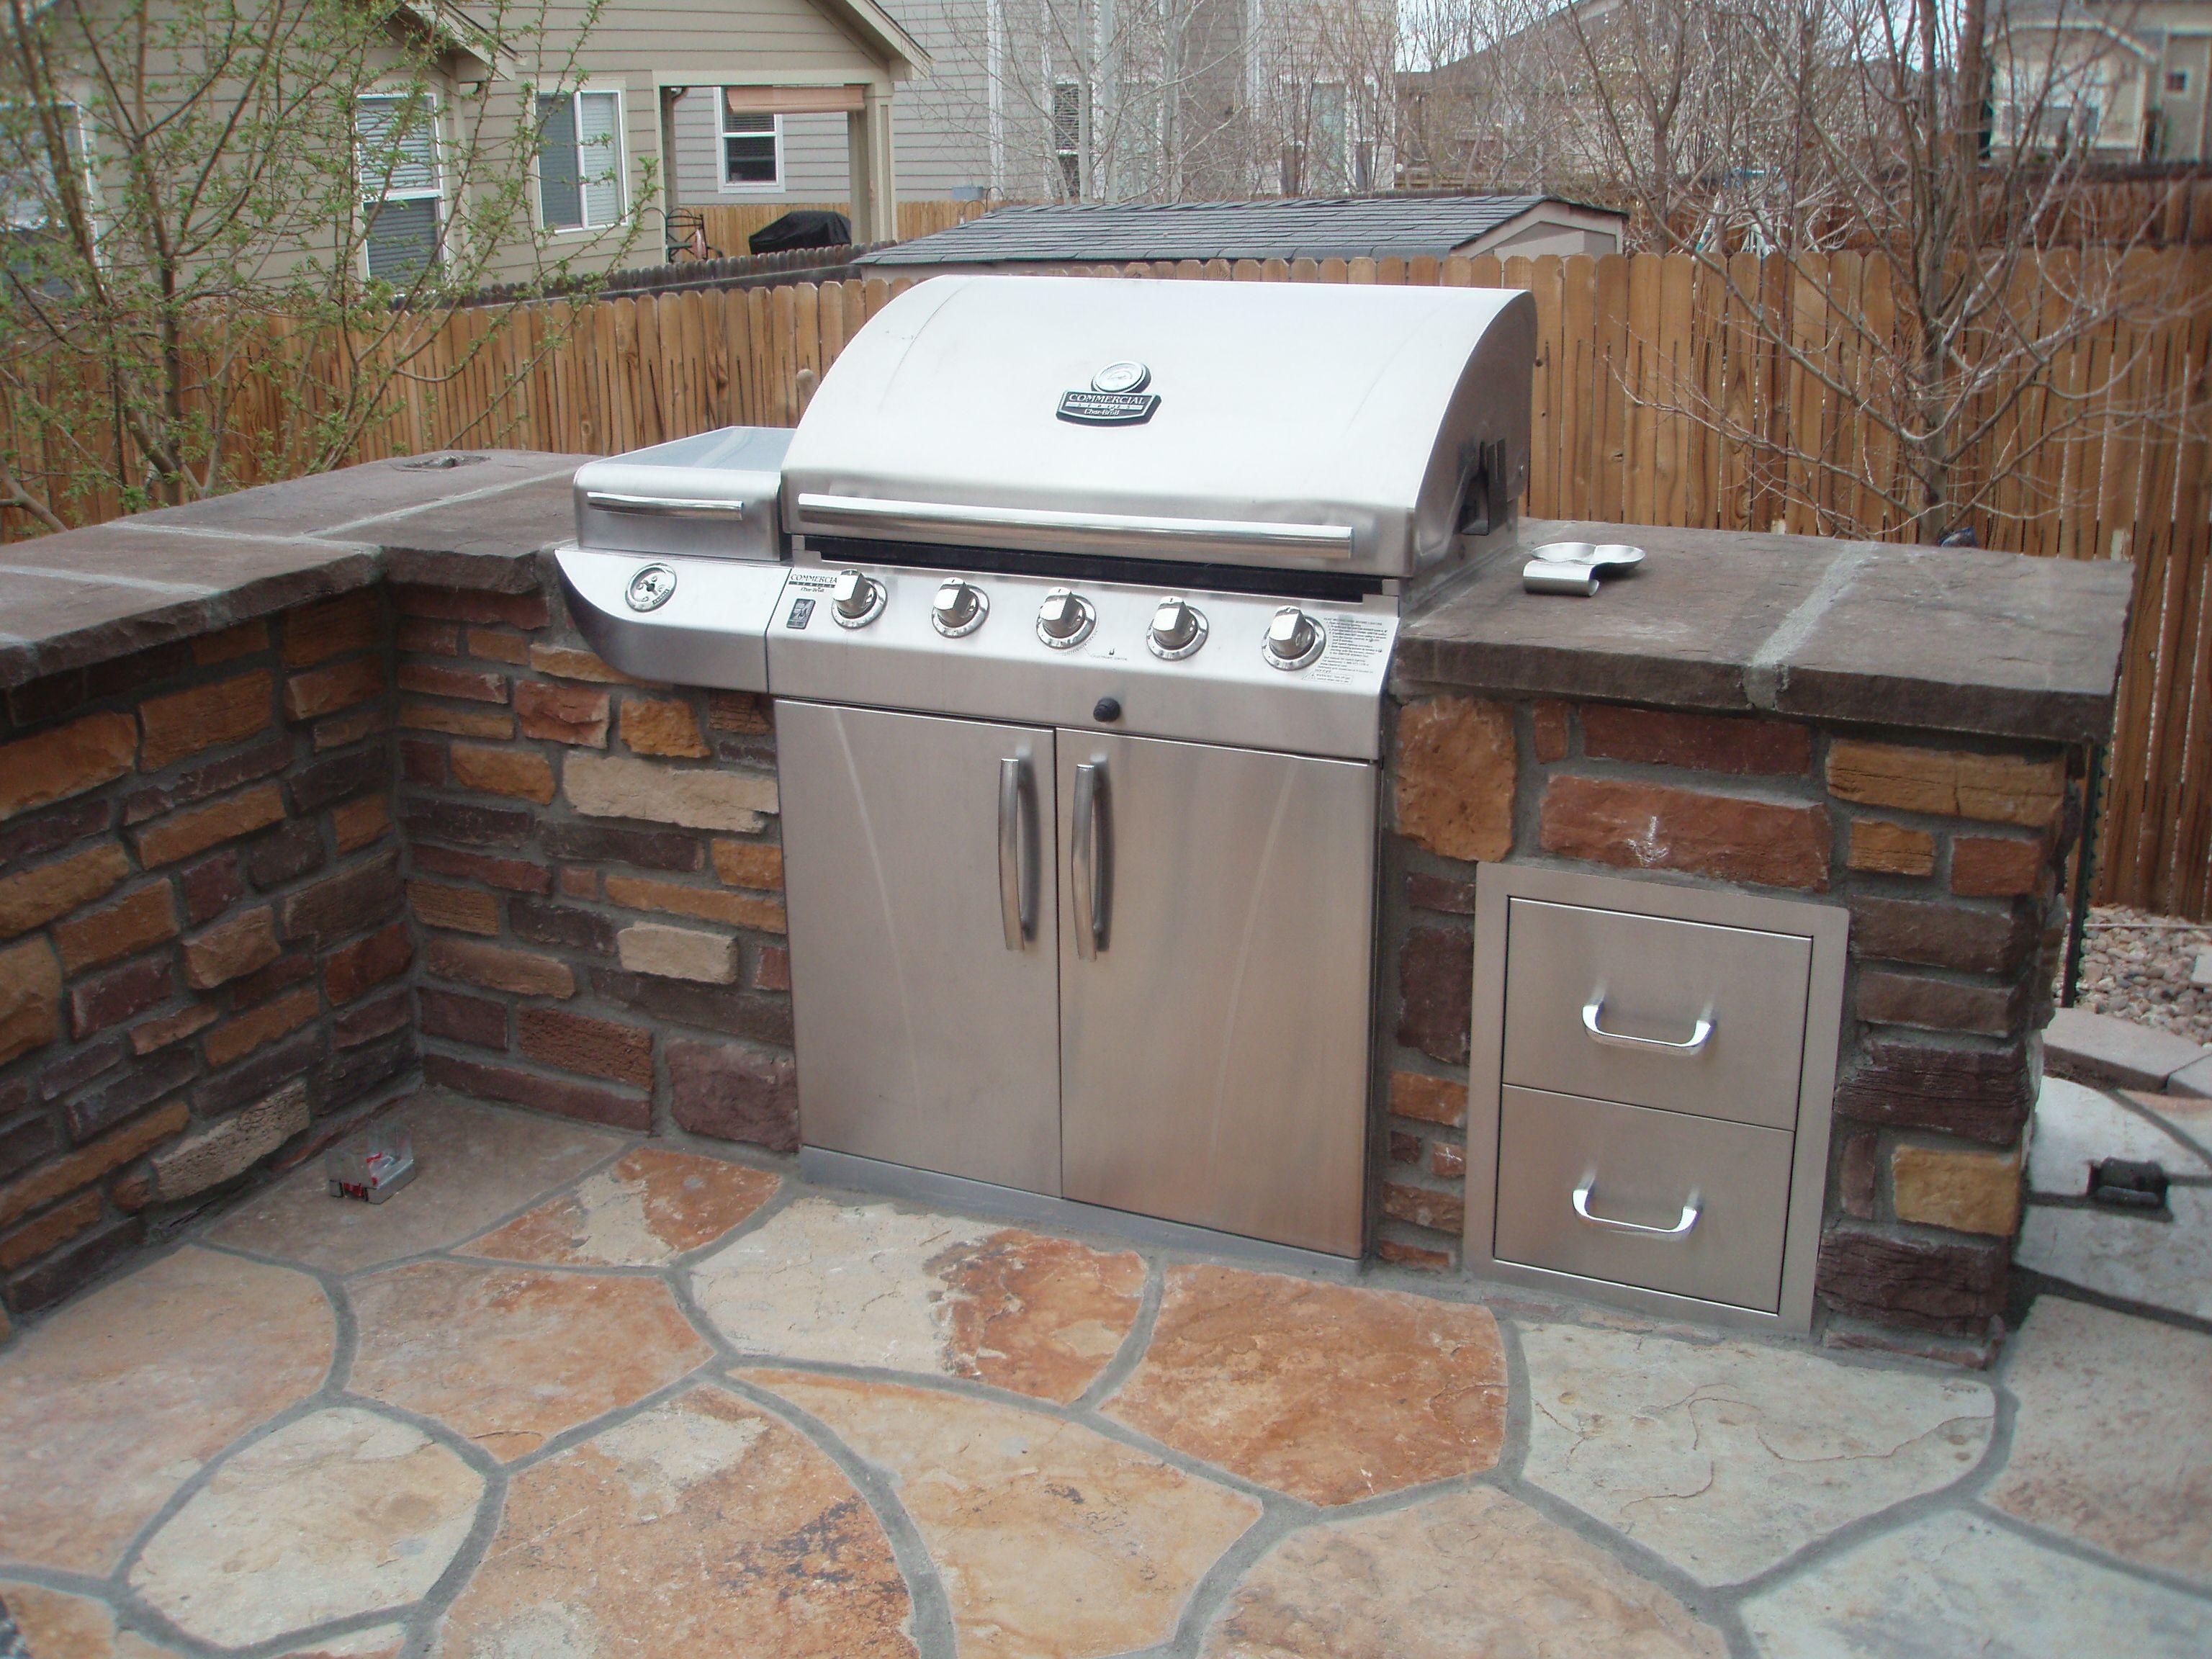 Matador Outdoor Kitchen Matador 4 Burner Stone Finish Outdoor Kitchen From Bunnings